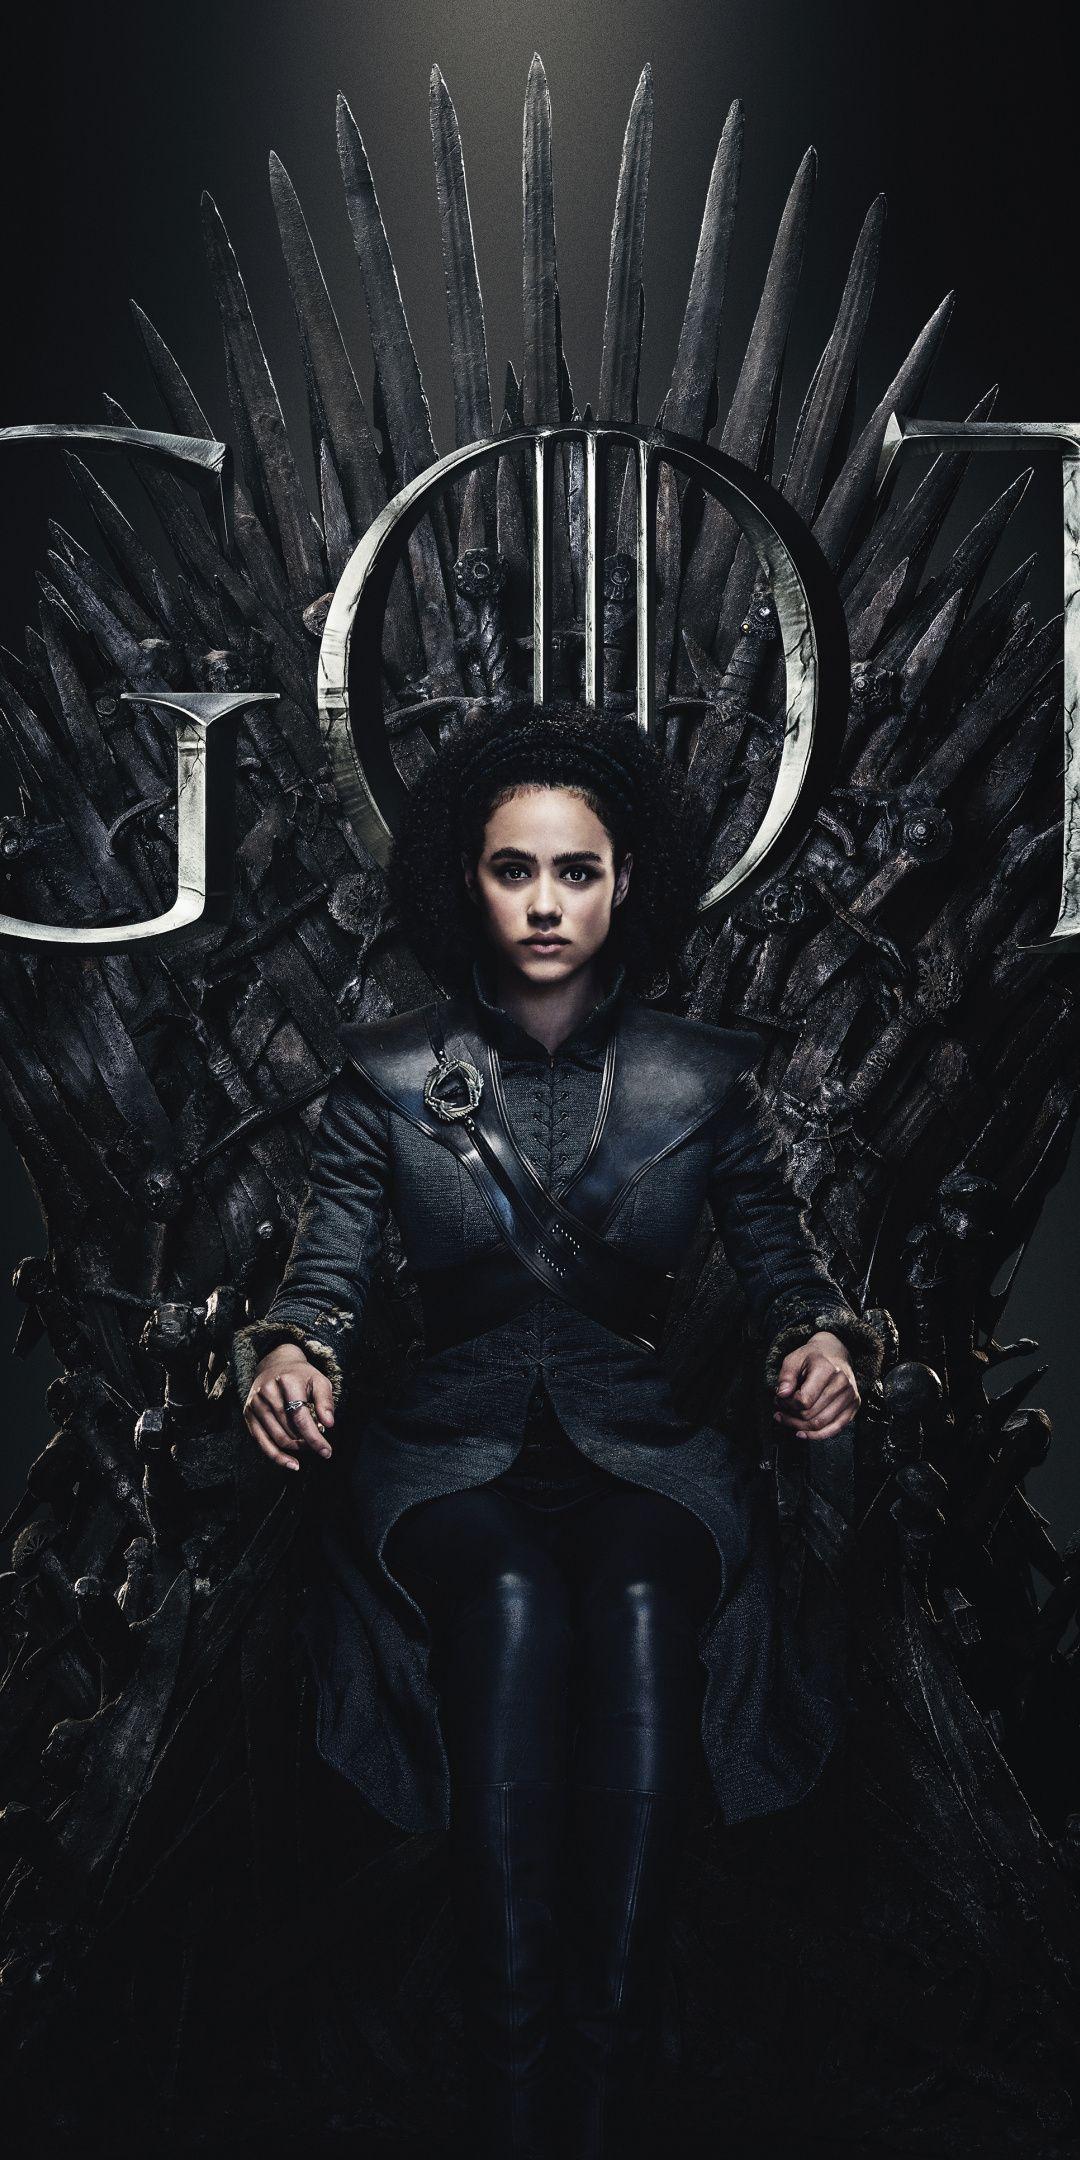 Nathalie Emmanuel Missandei Game Of Thrones Season 8 2019 1080x2160 Wallpaper Game Of Thrones Sansa Sansa Stark Sansa Stark Wallpaper